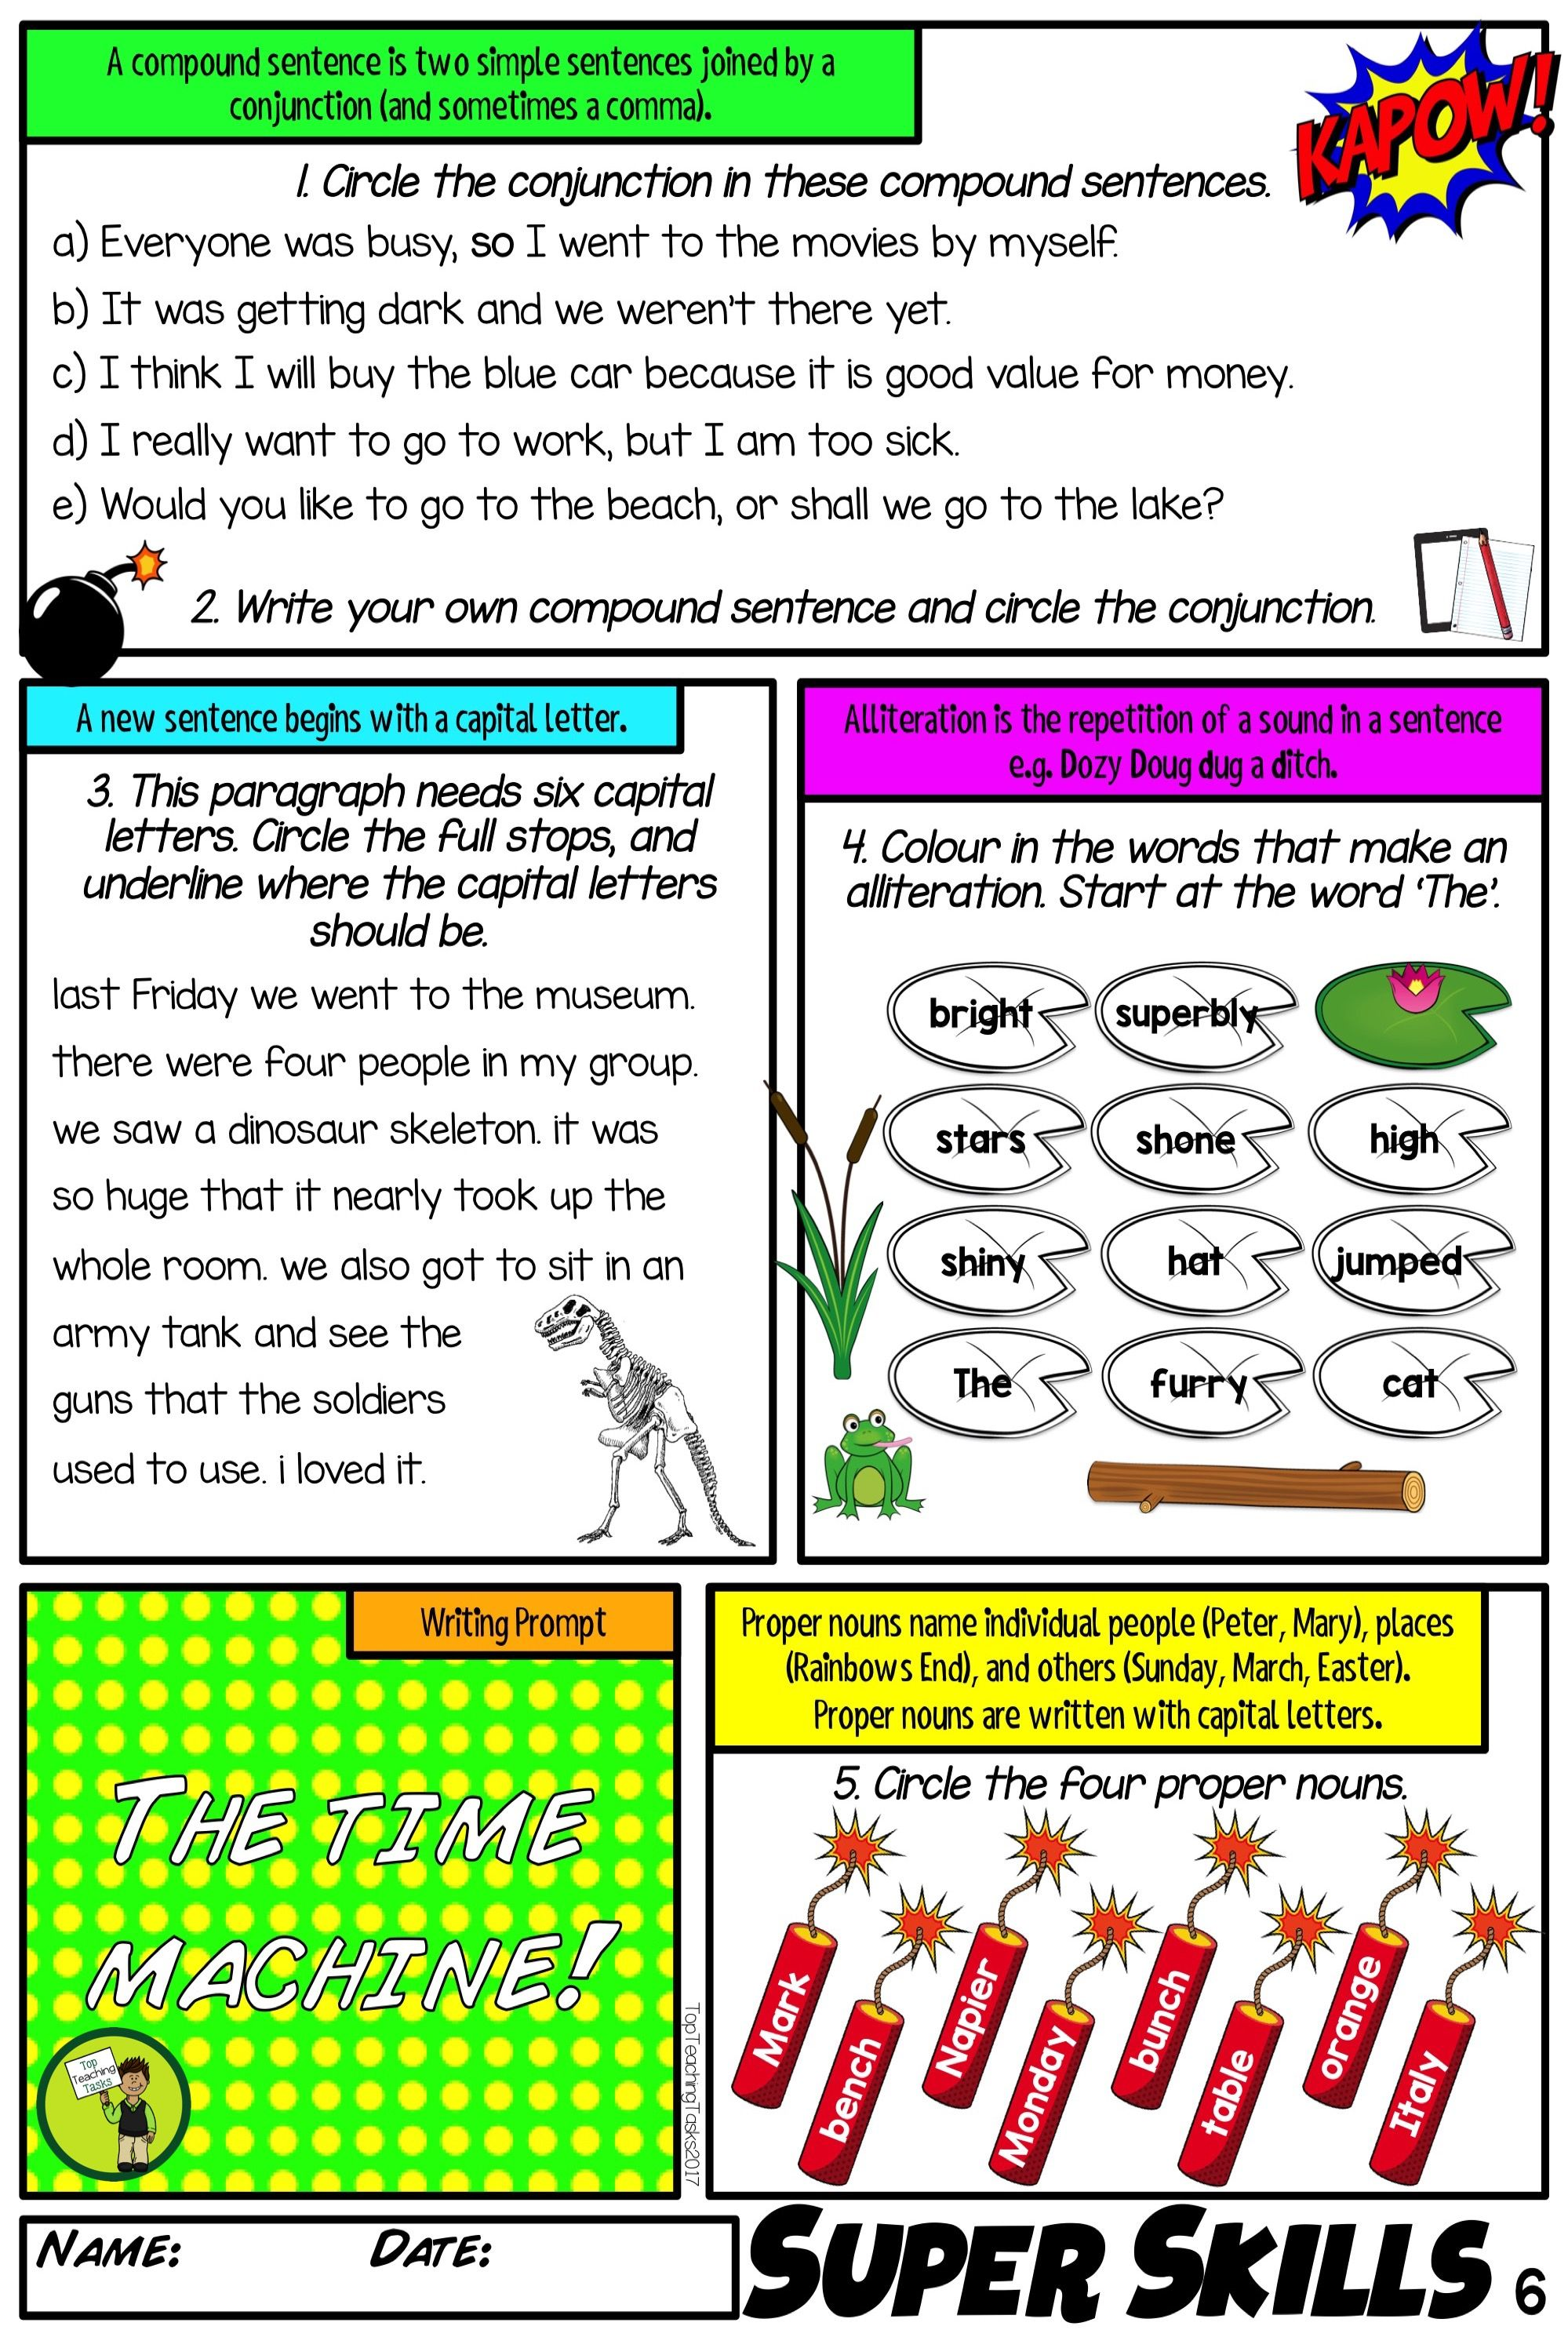 Grammar Punctuation Spelling Vocabulary Literacy Skills Vocabulary Sentences Explanation Writing Expository Writing [ 2993 x 1999 Pixel ]